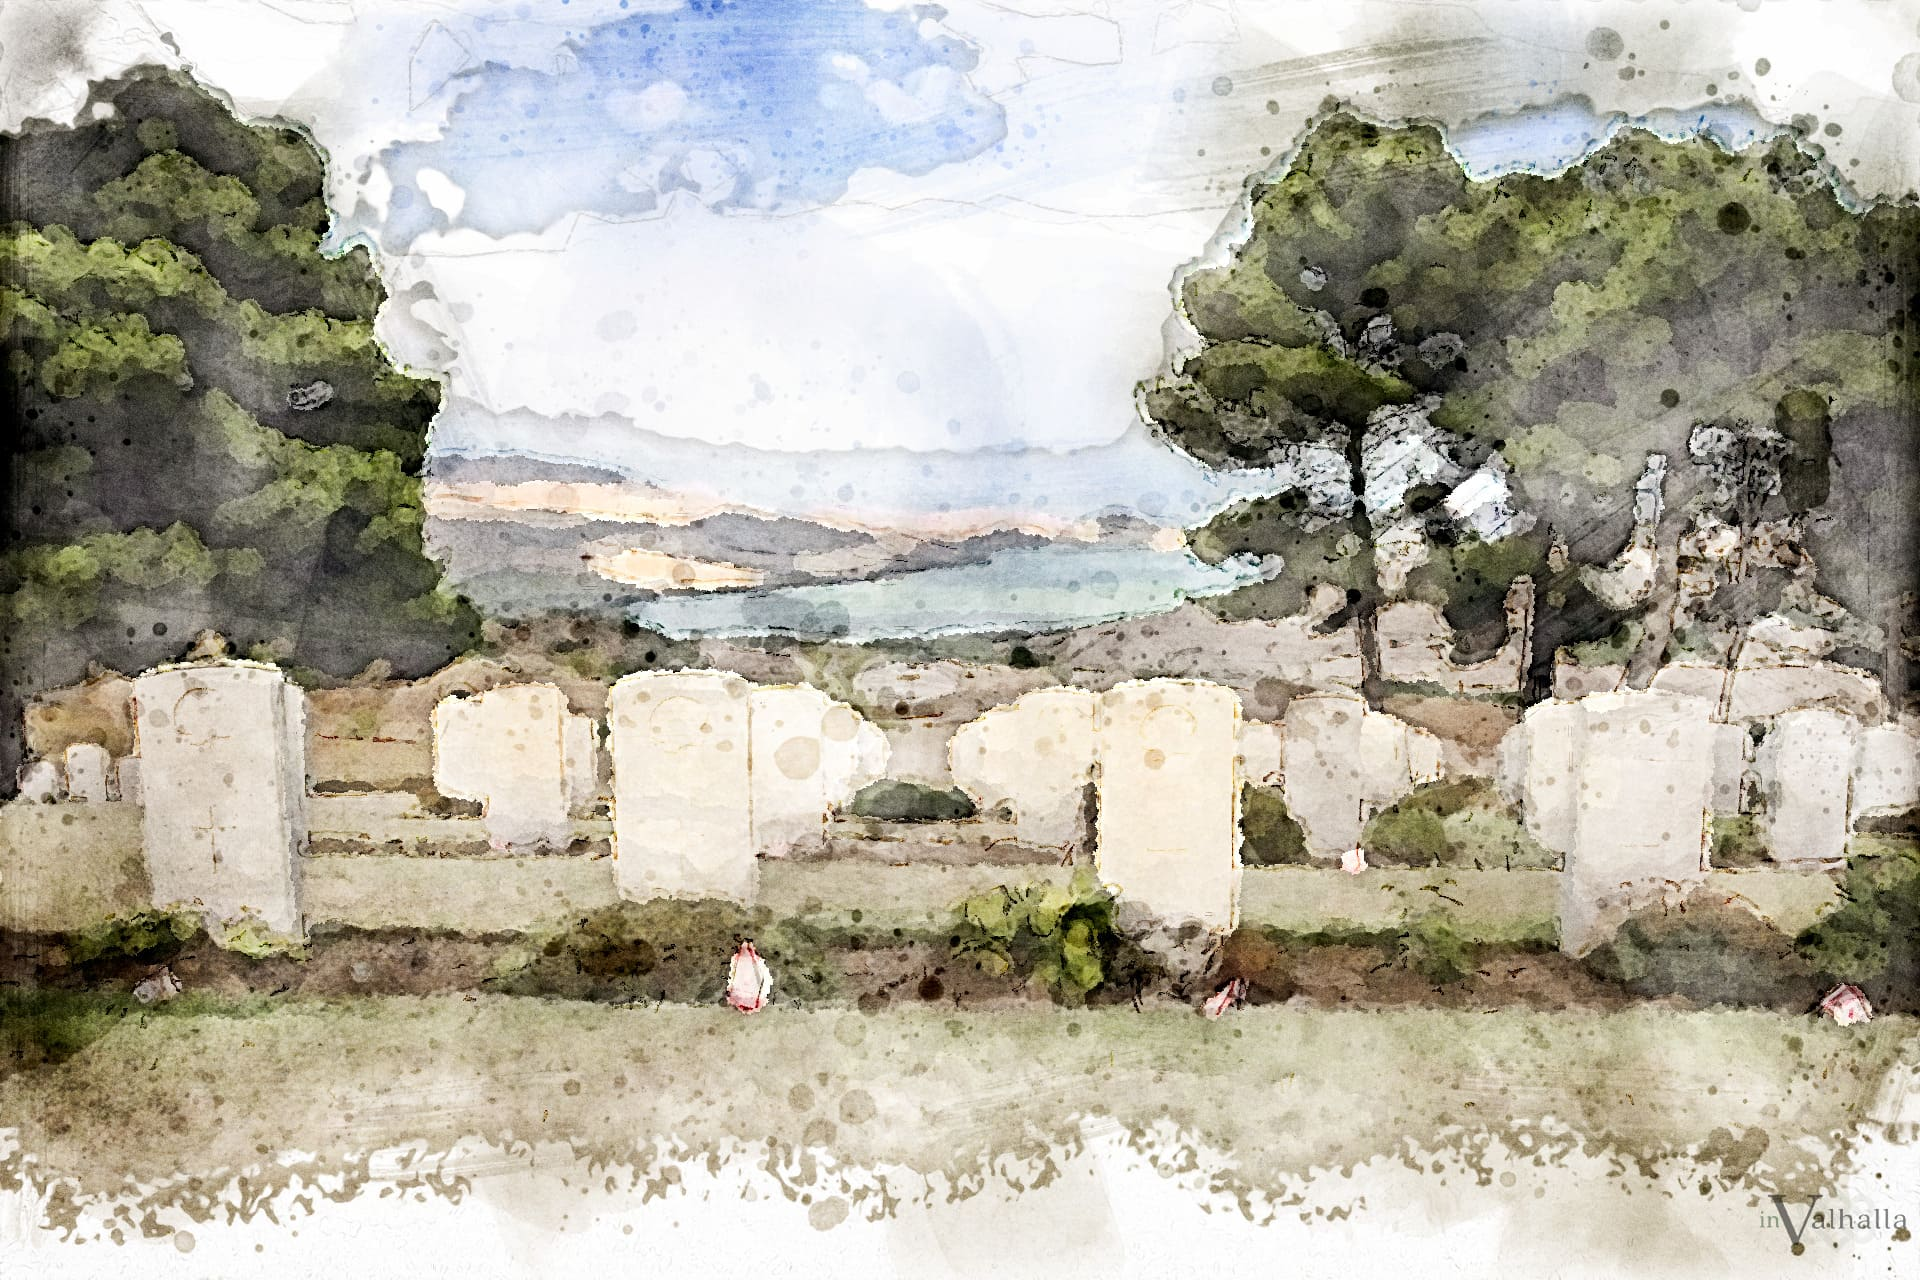 Upright Marker Headstones in Cemetery